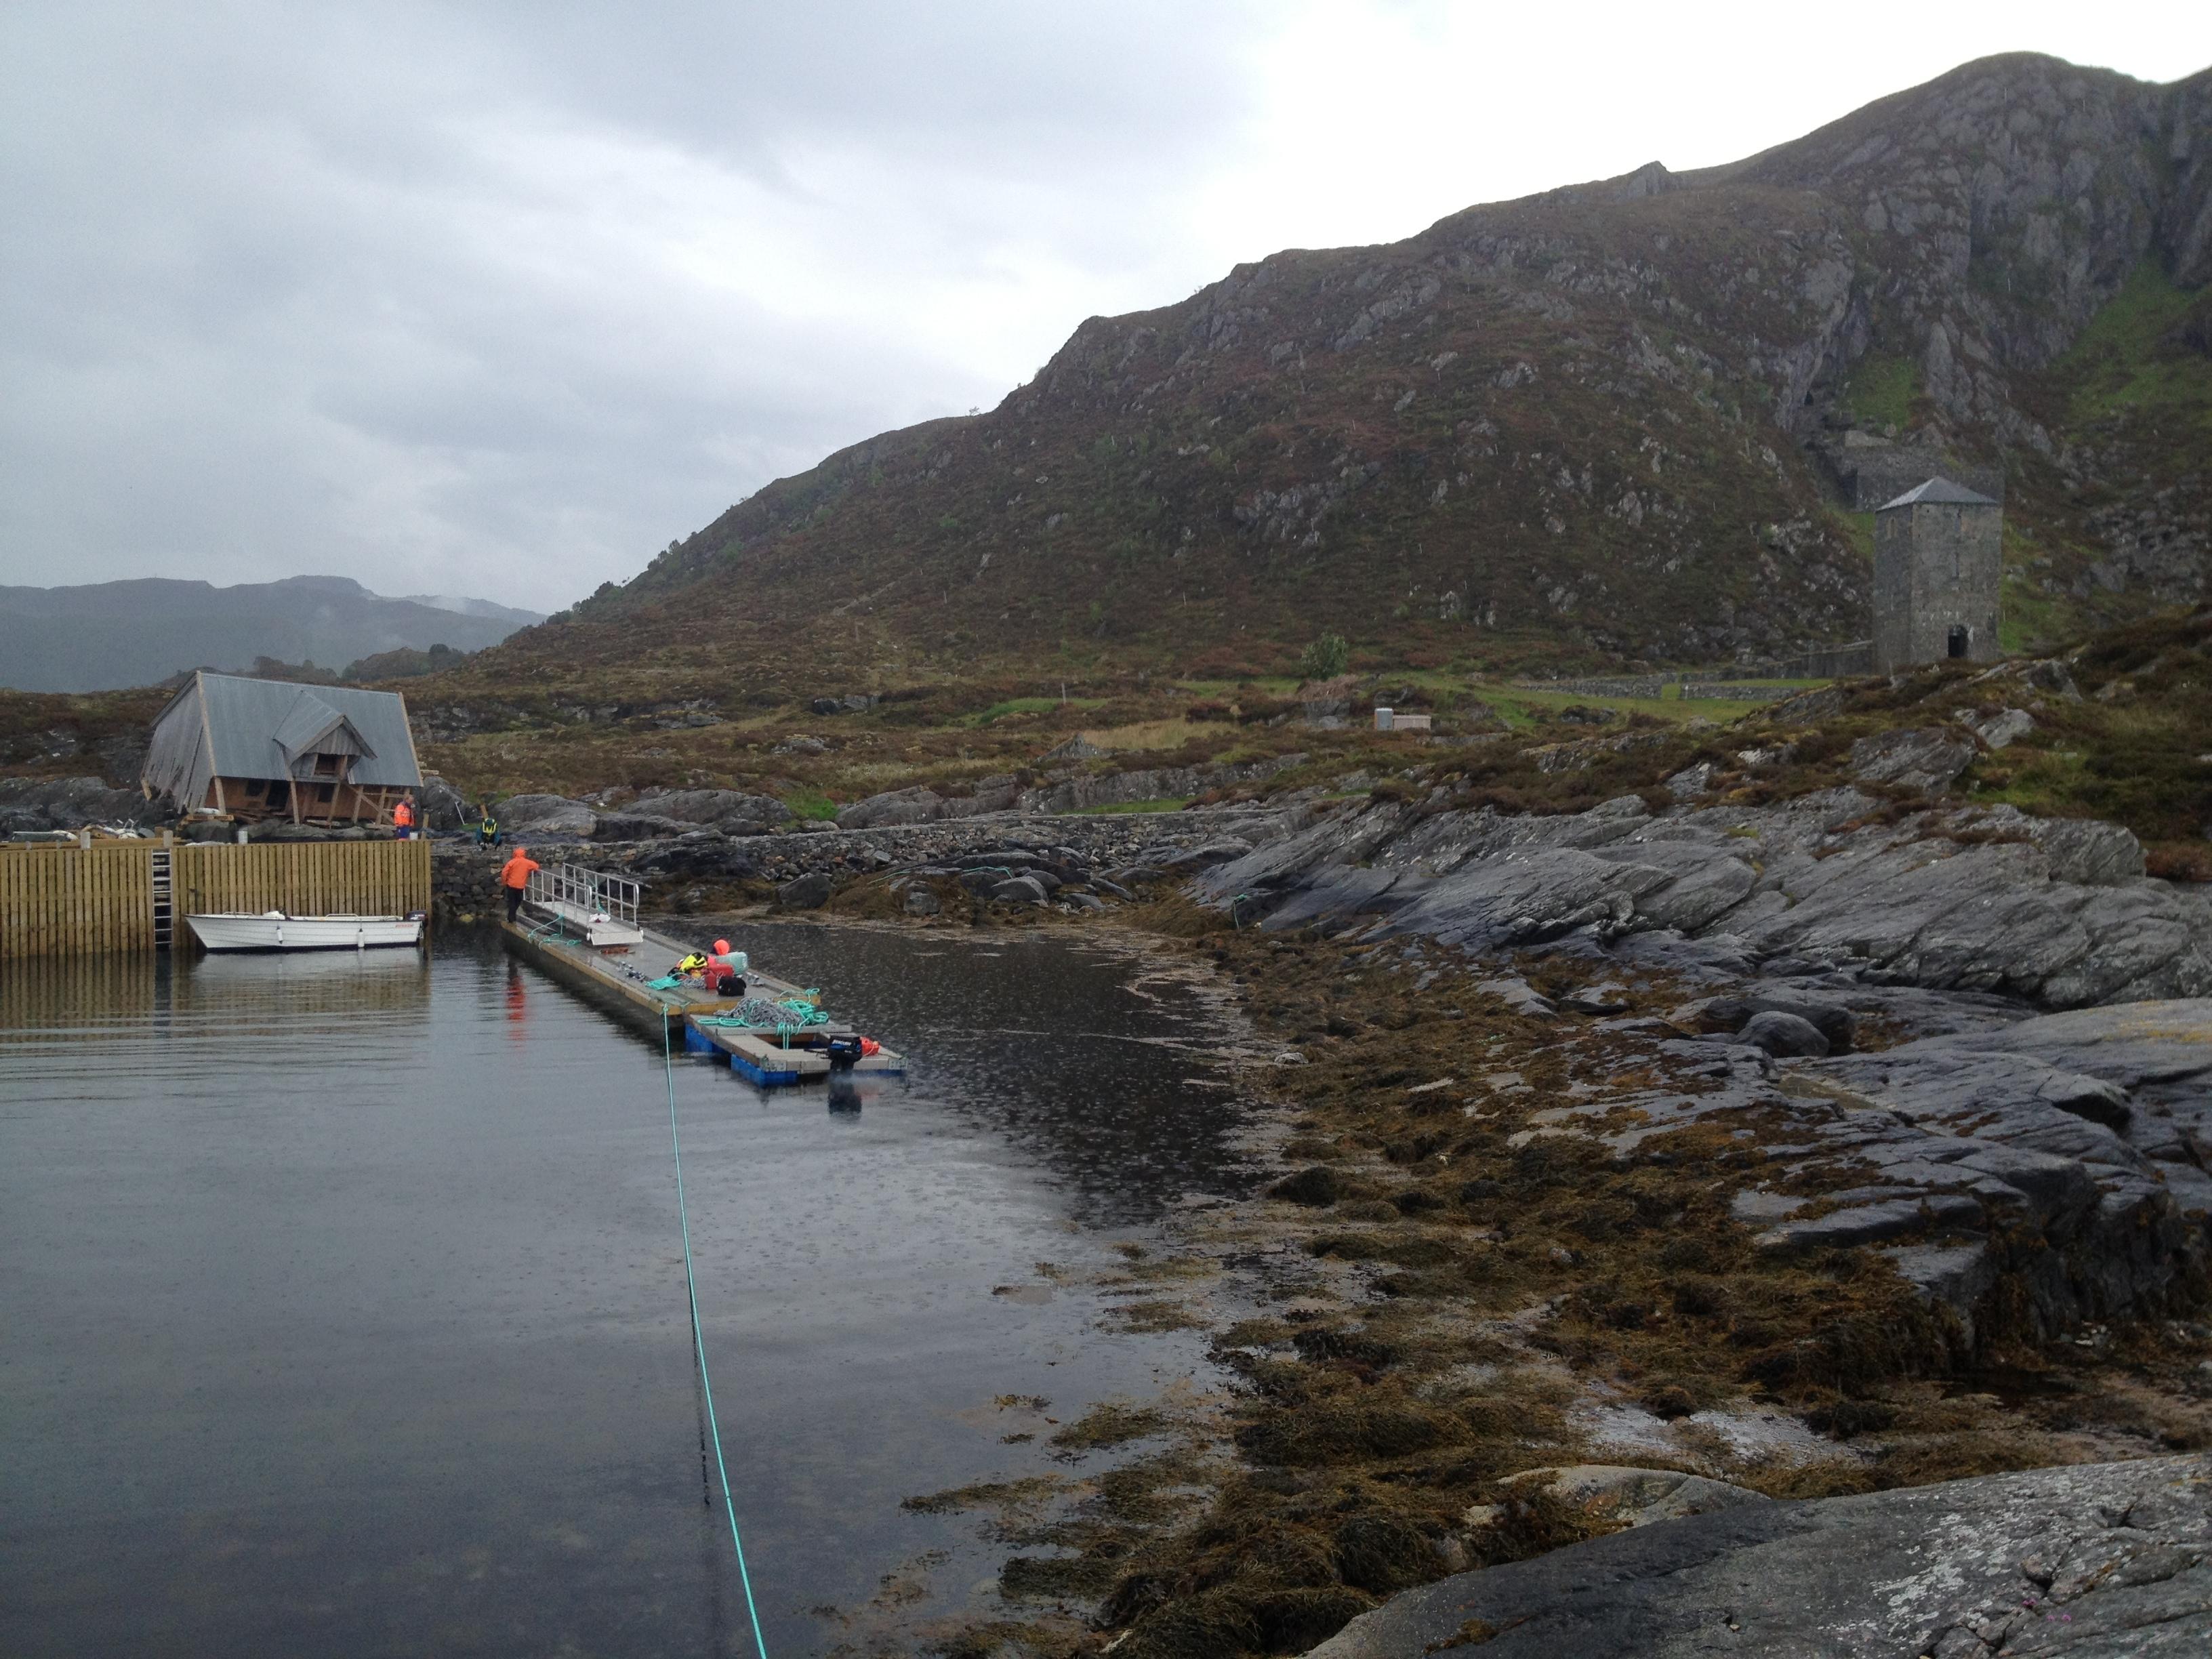 https://marinasolutions.no/uploads/Selje-kommune_Selje-kloster-1.JPG